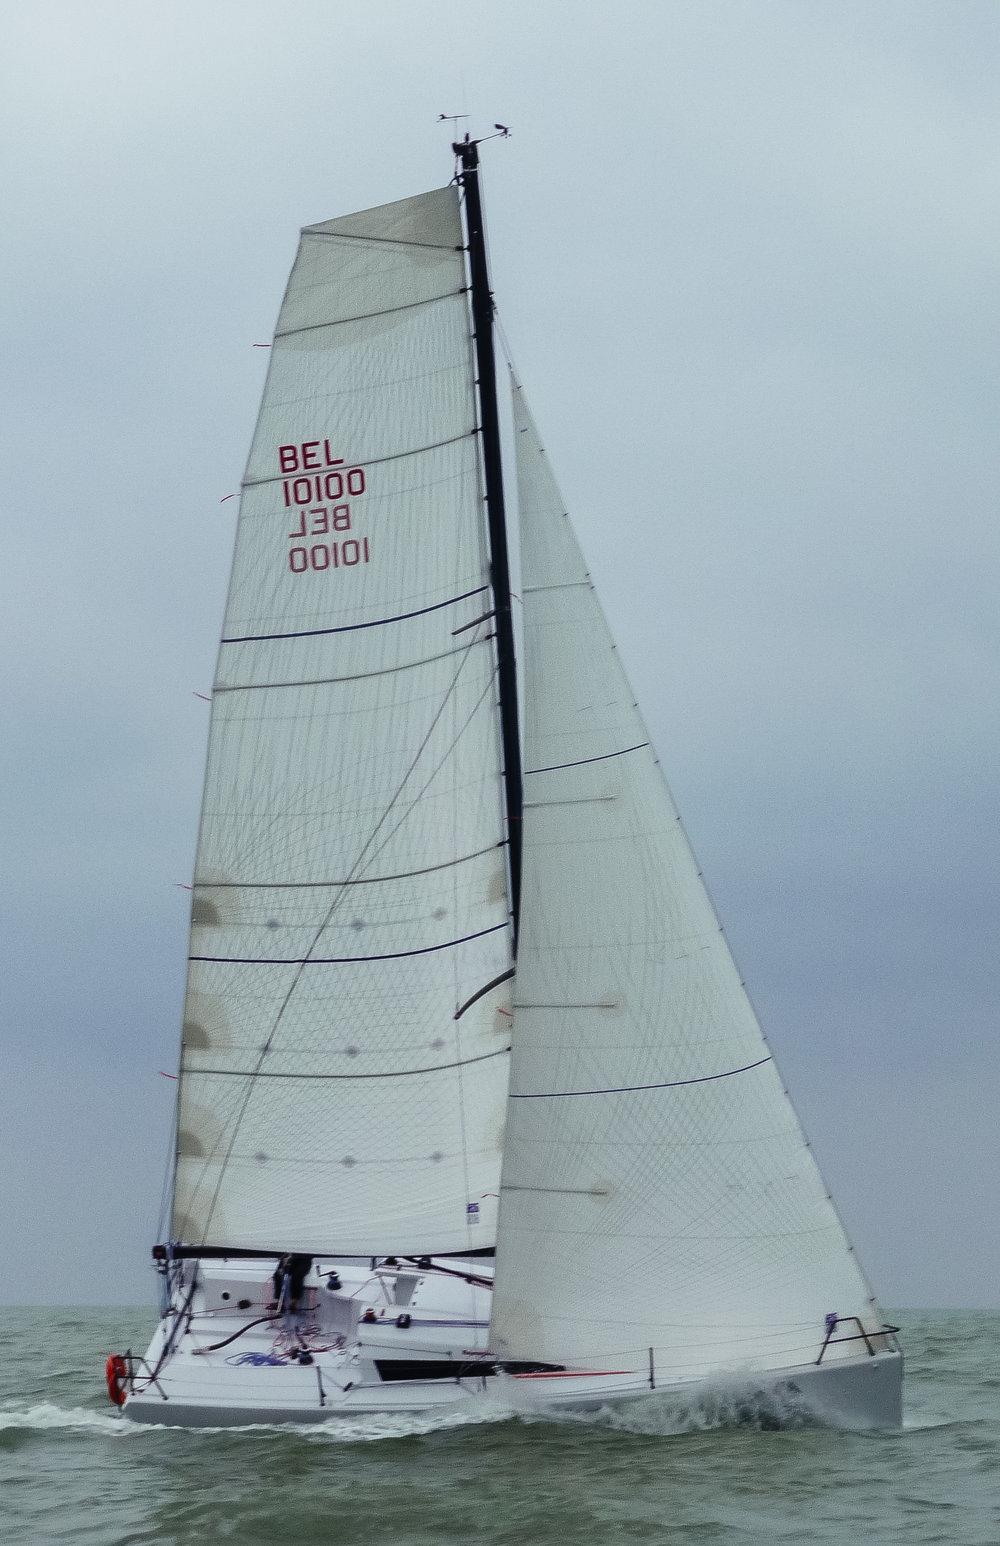 UK Sailmakers Square Top Mainsail 6 Nacira 9.50 Lamia.jpg